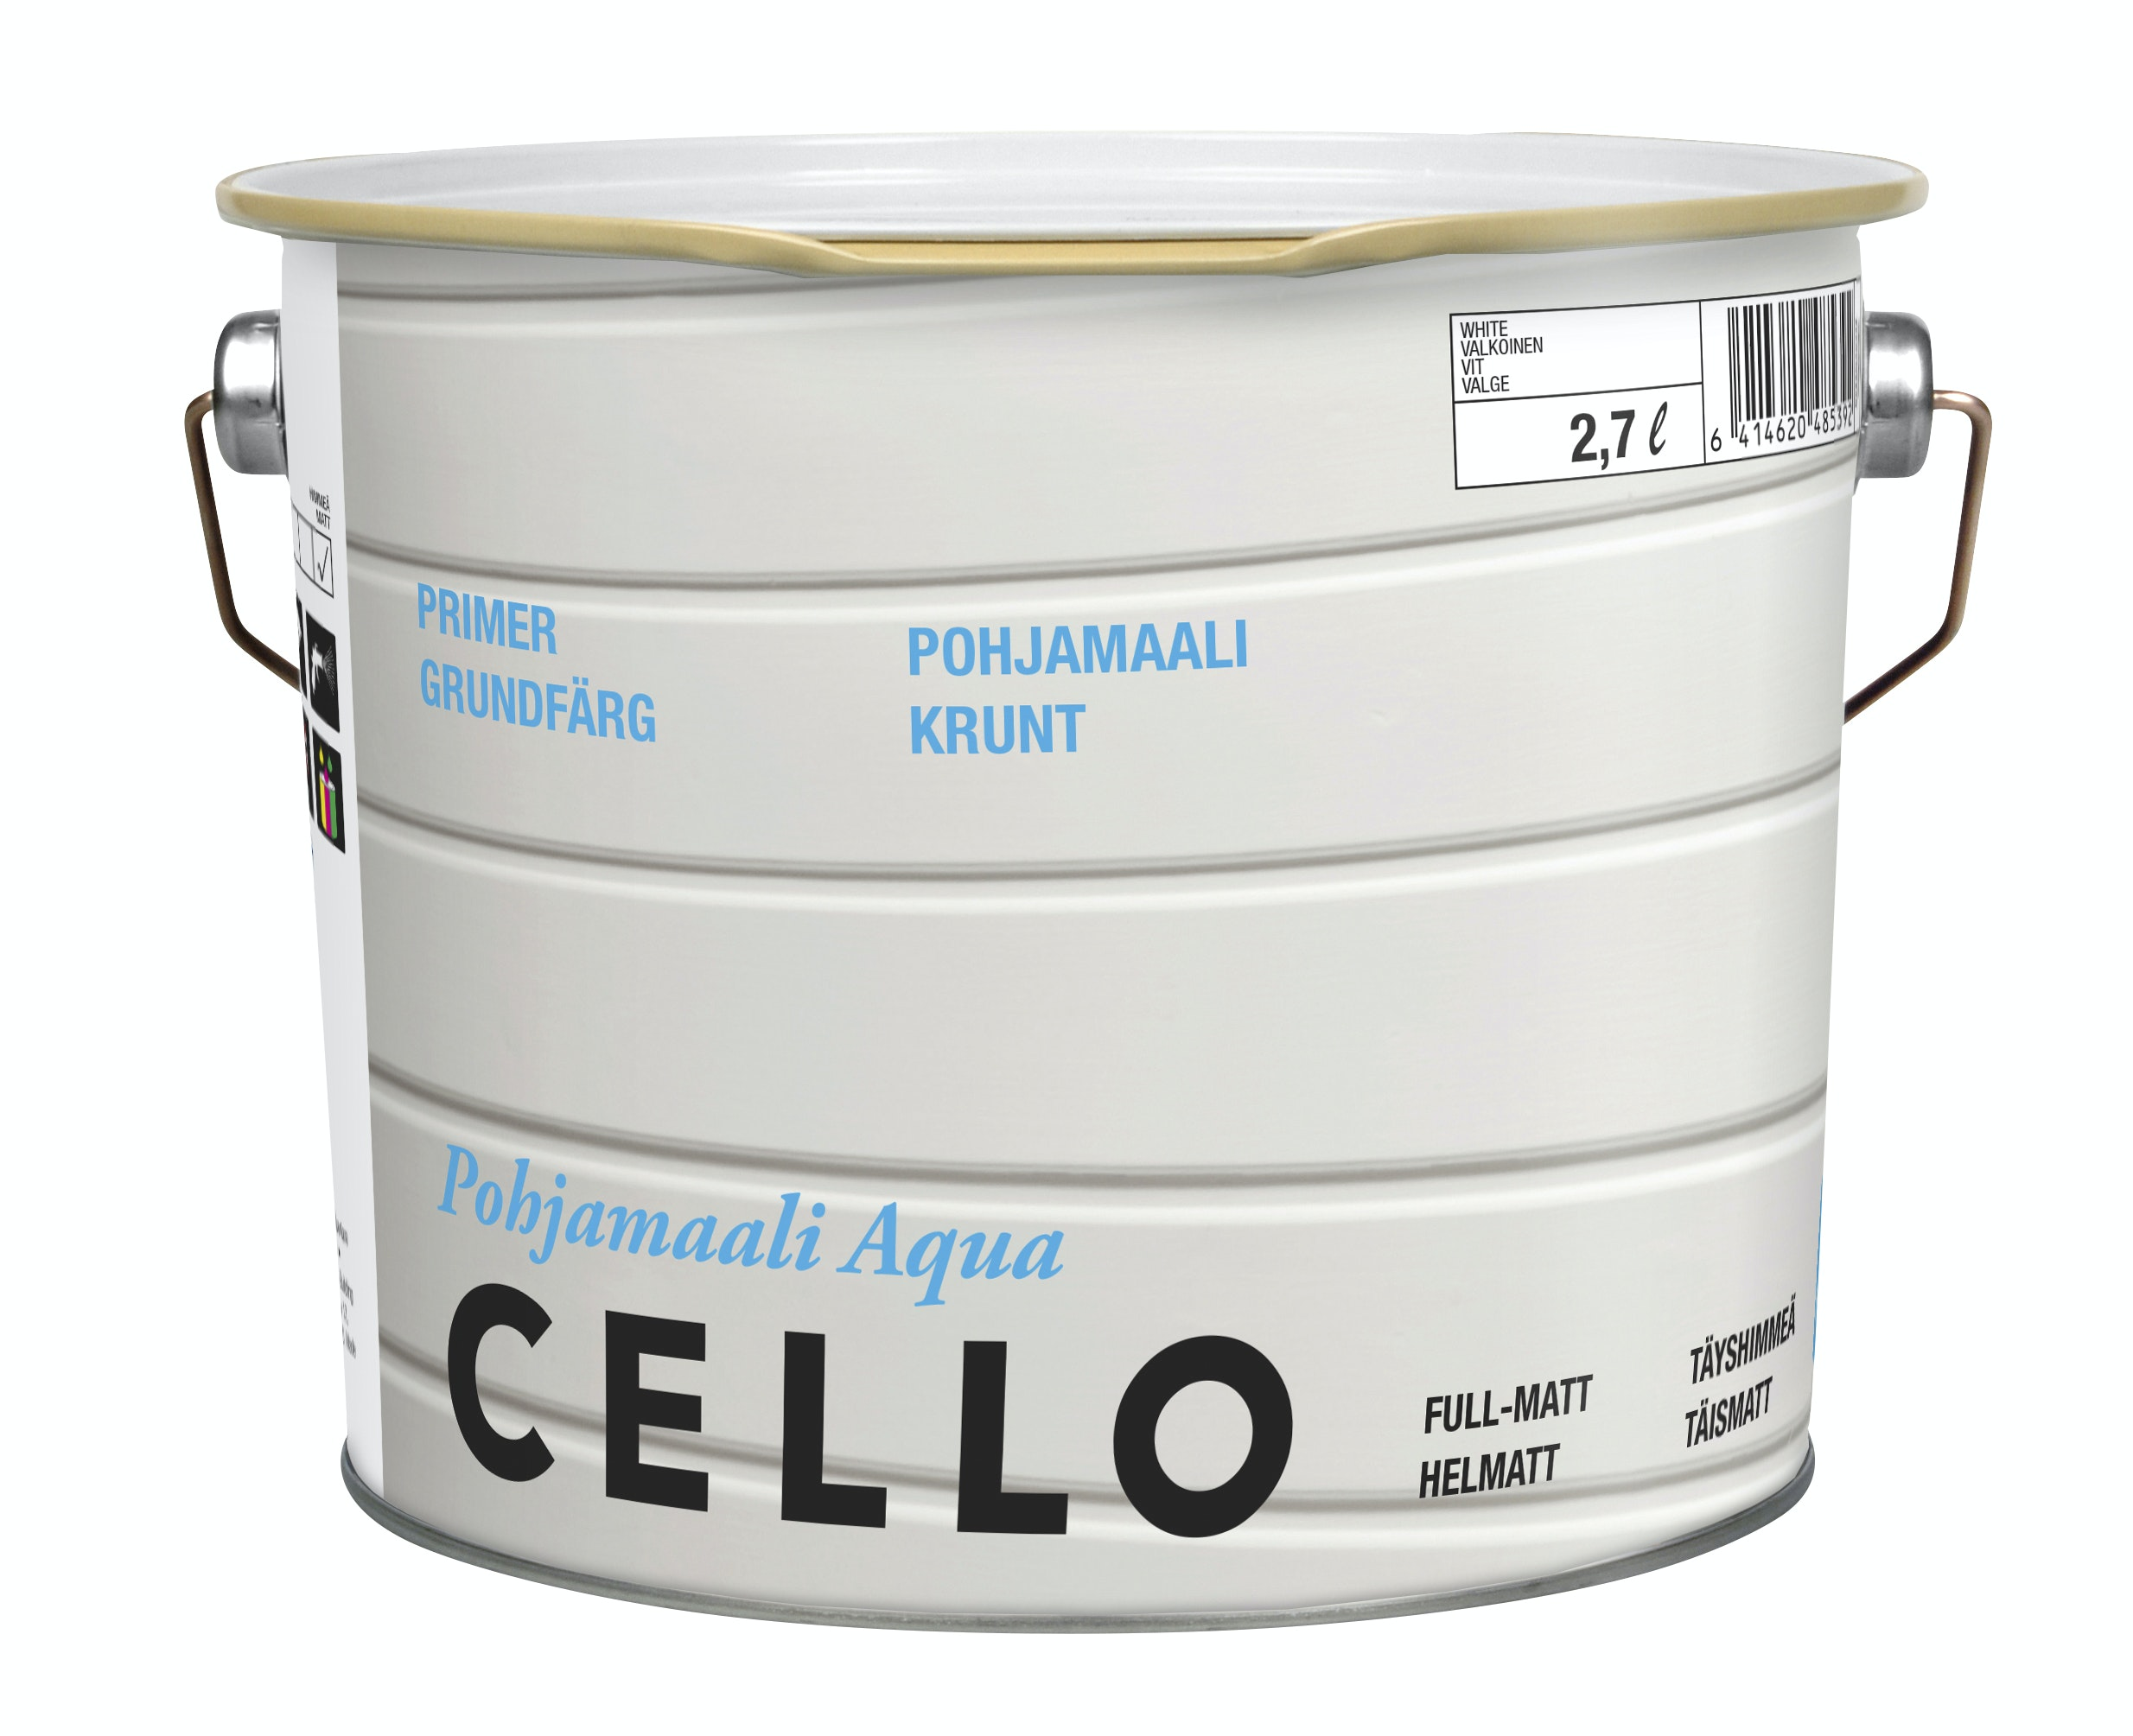 Grundfärg Cello Aqua Helmatt Vit/Bas 1 2,7l